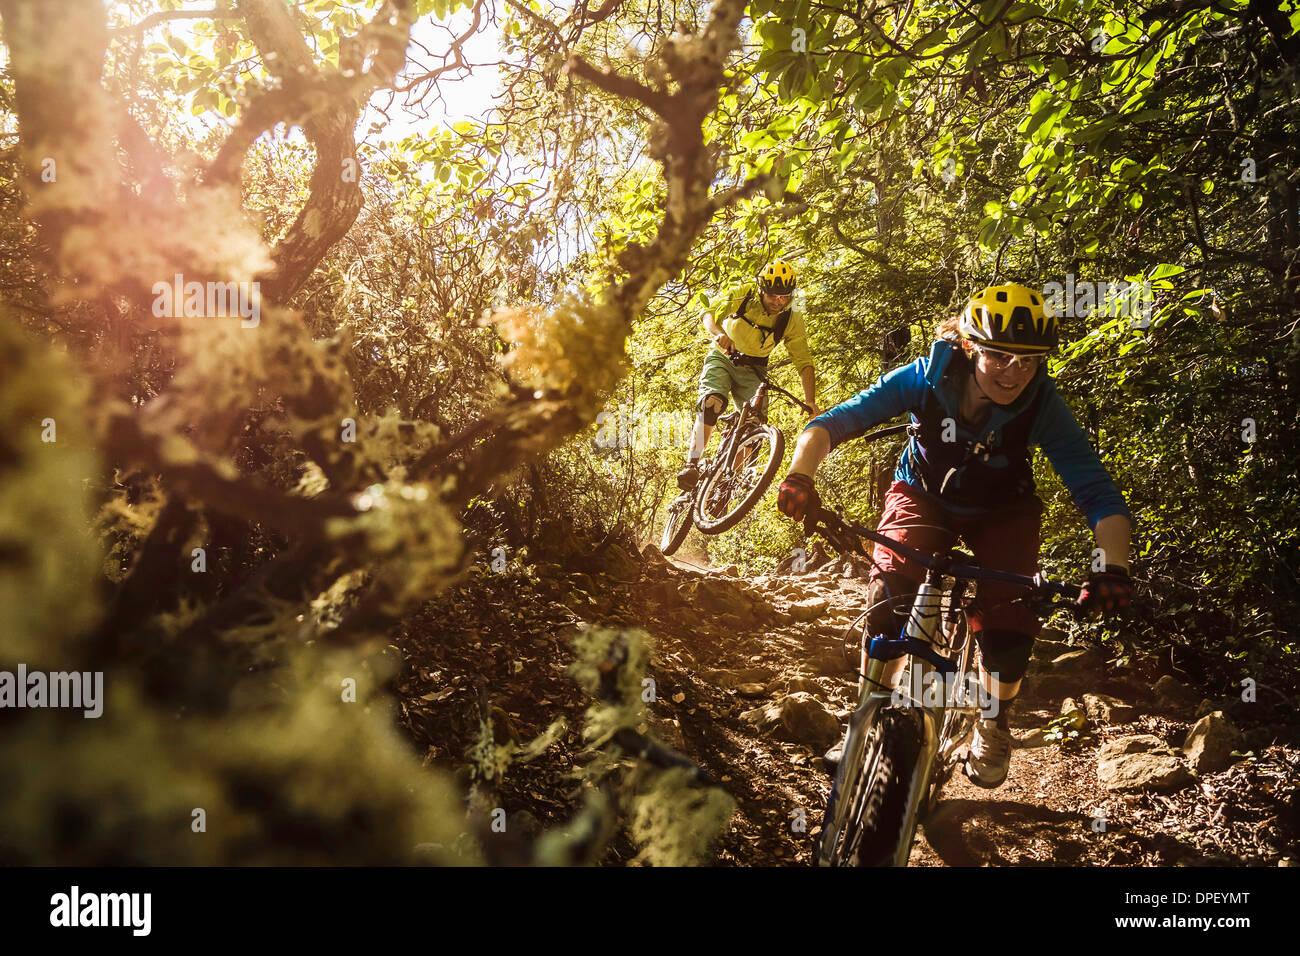 Young couple mountain biking, Soquel Demonstration State Forest, Santa Cruz, California, USA - Stock Image